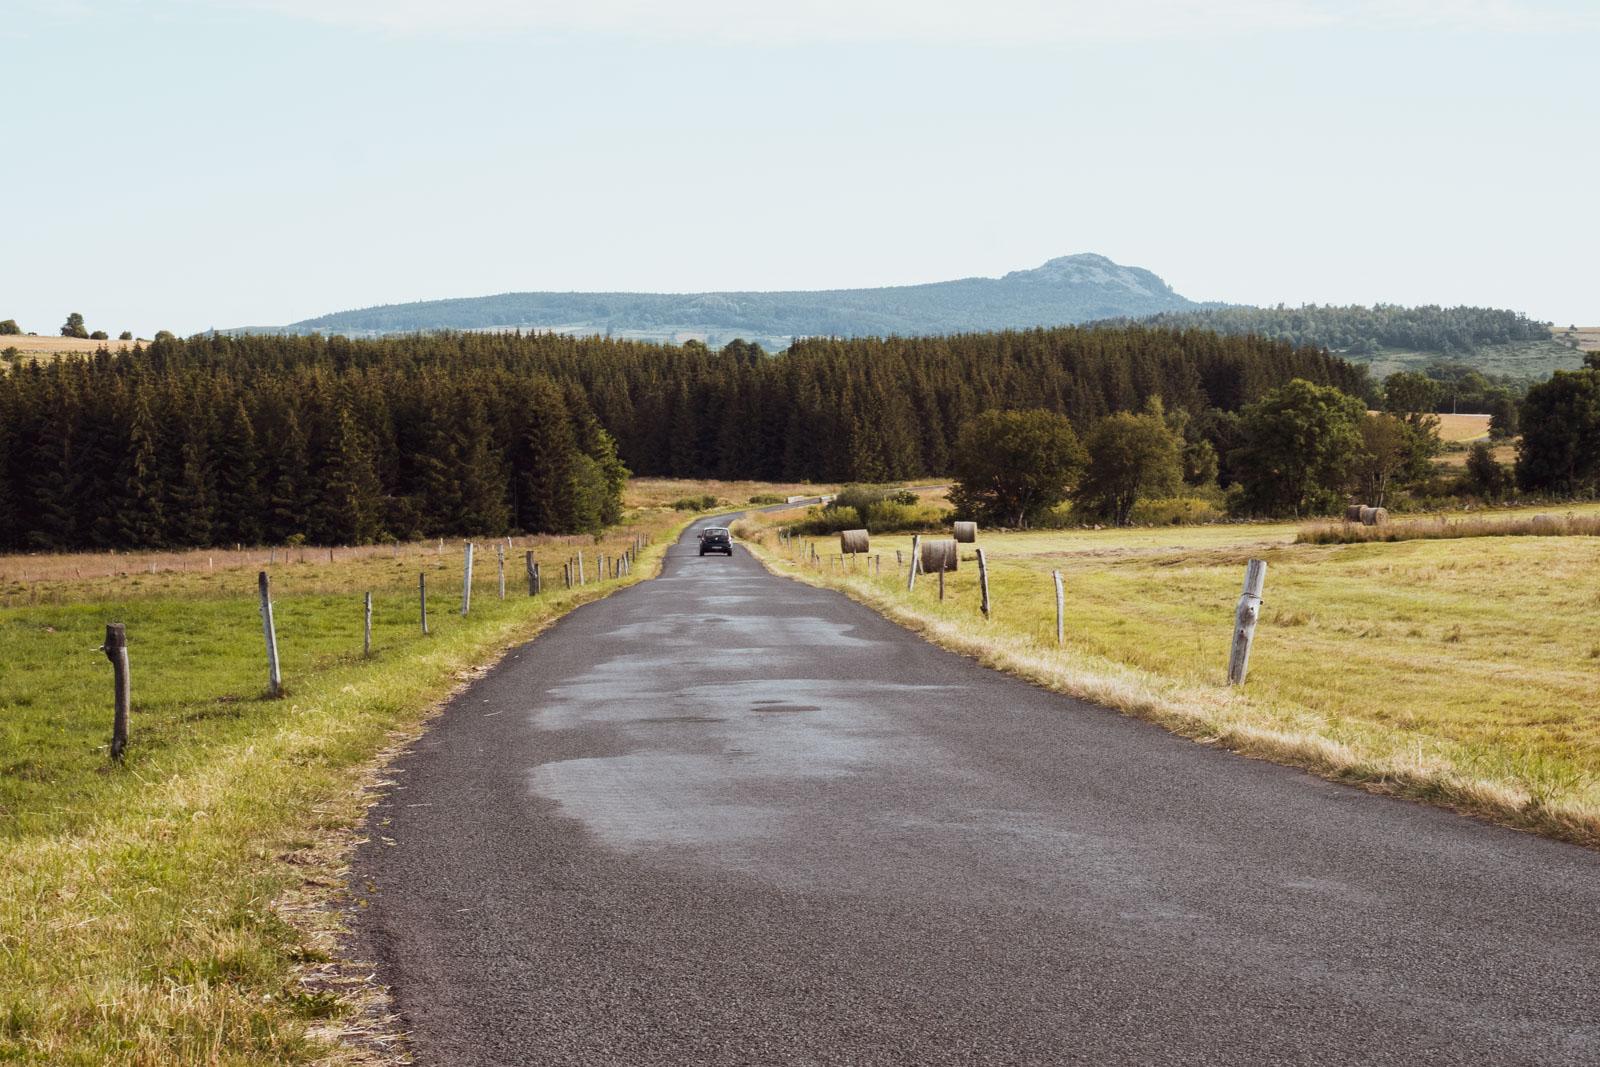 road-trip-france-inspiration